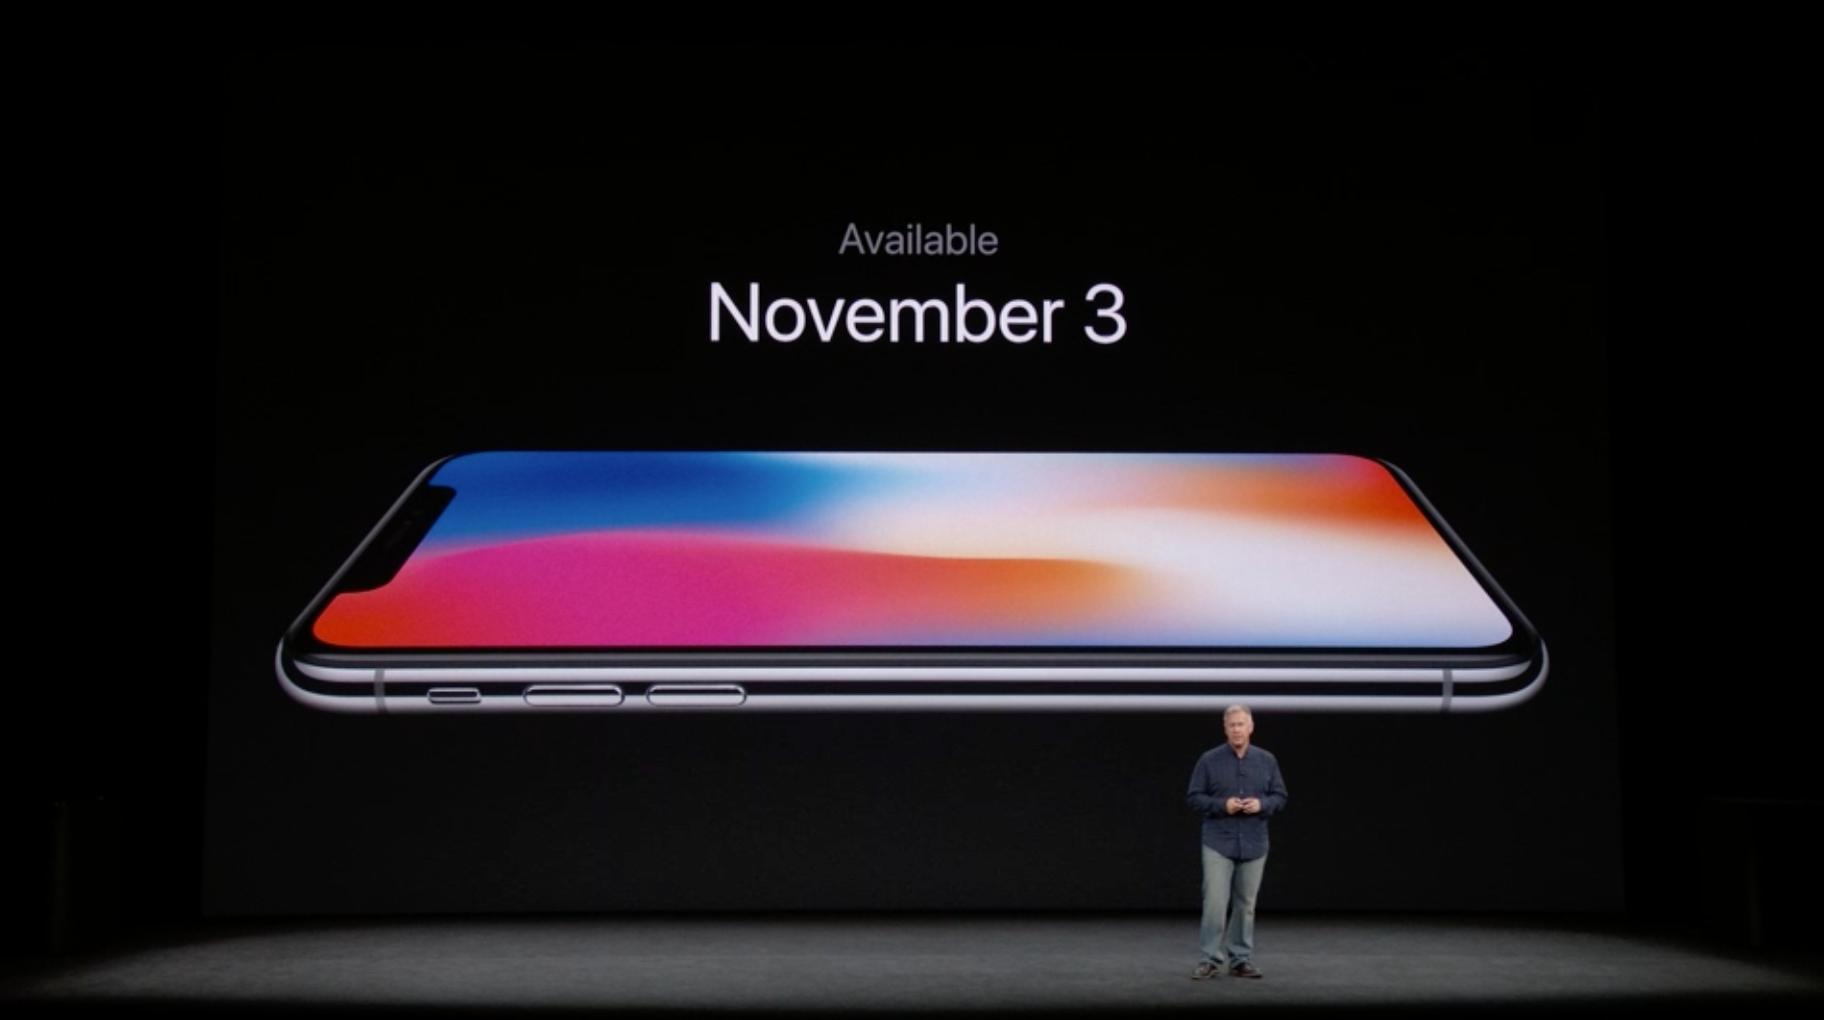 Noviembre 3 iPhone X